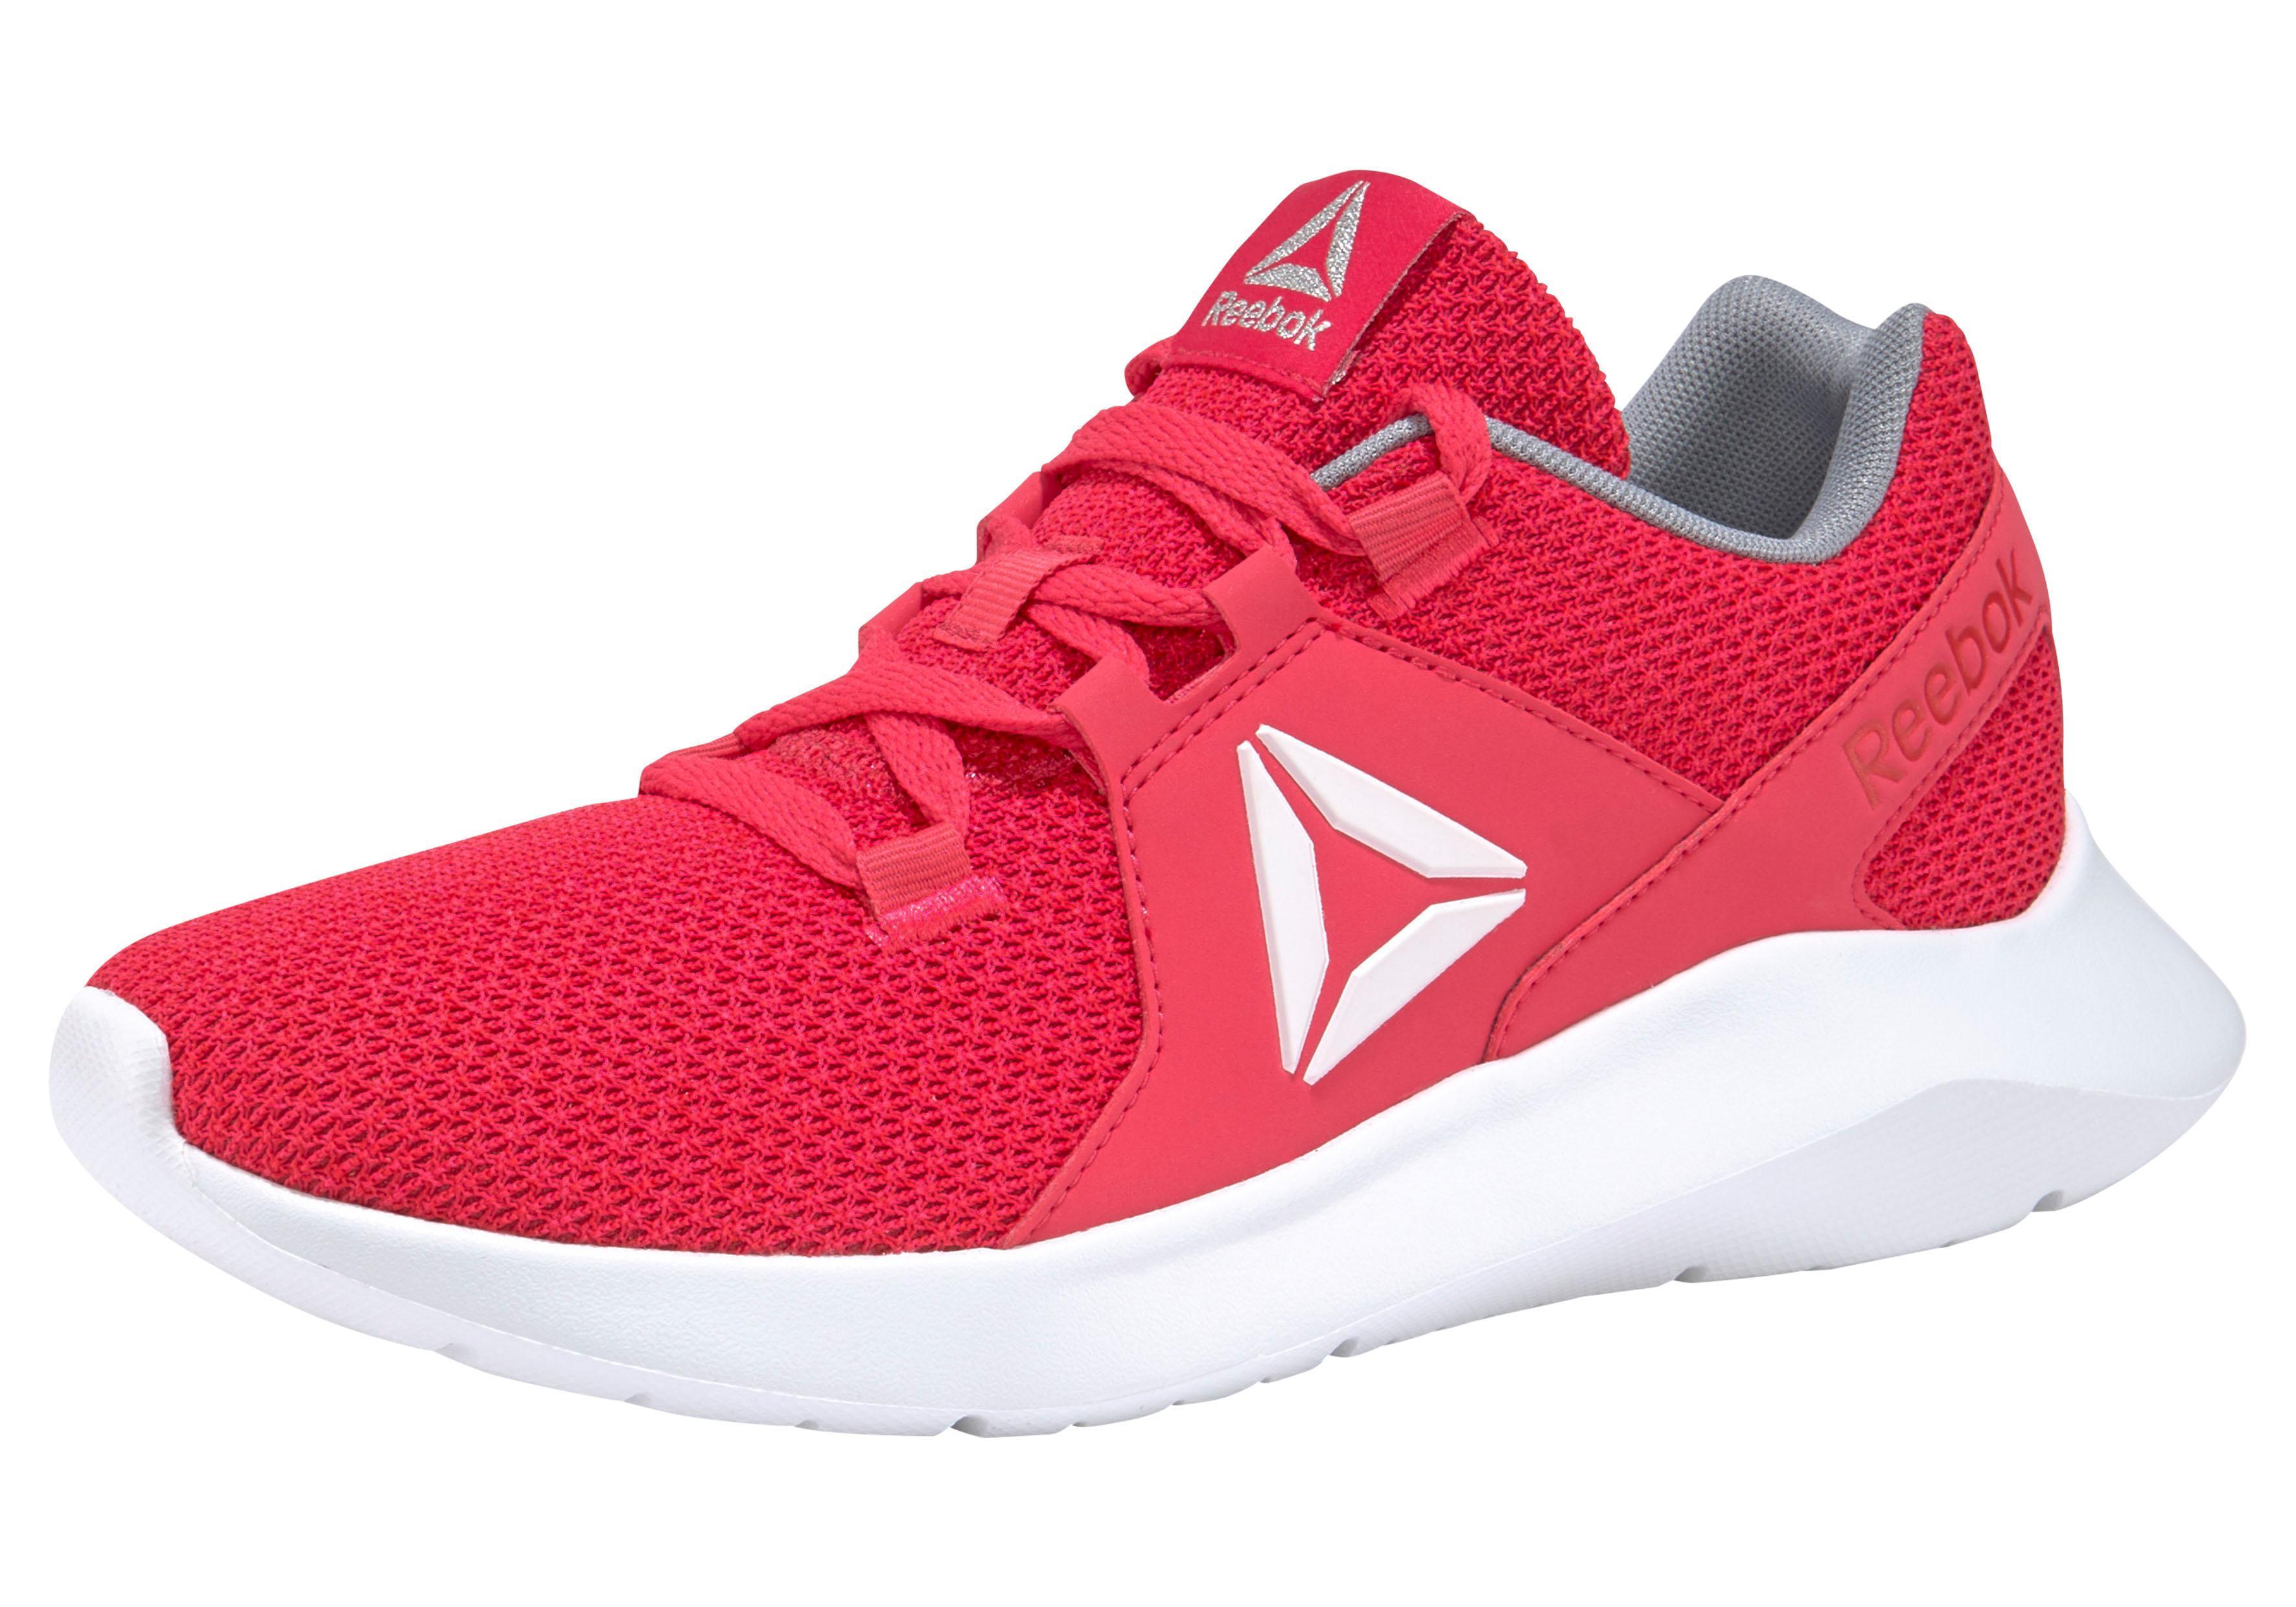 Reebok Laufschuh Energylux W | Schuhe > Sportschuhe | Reebok